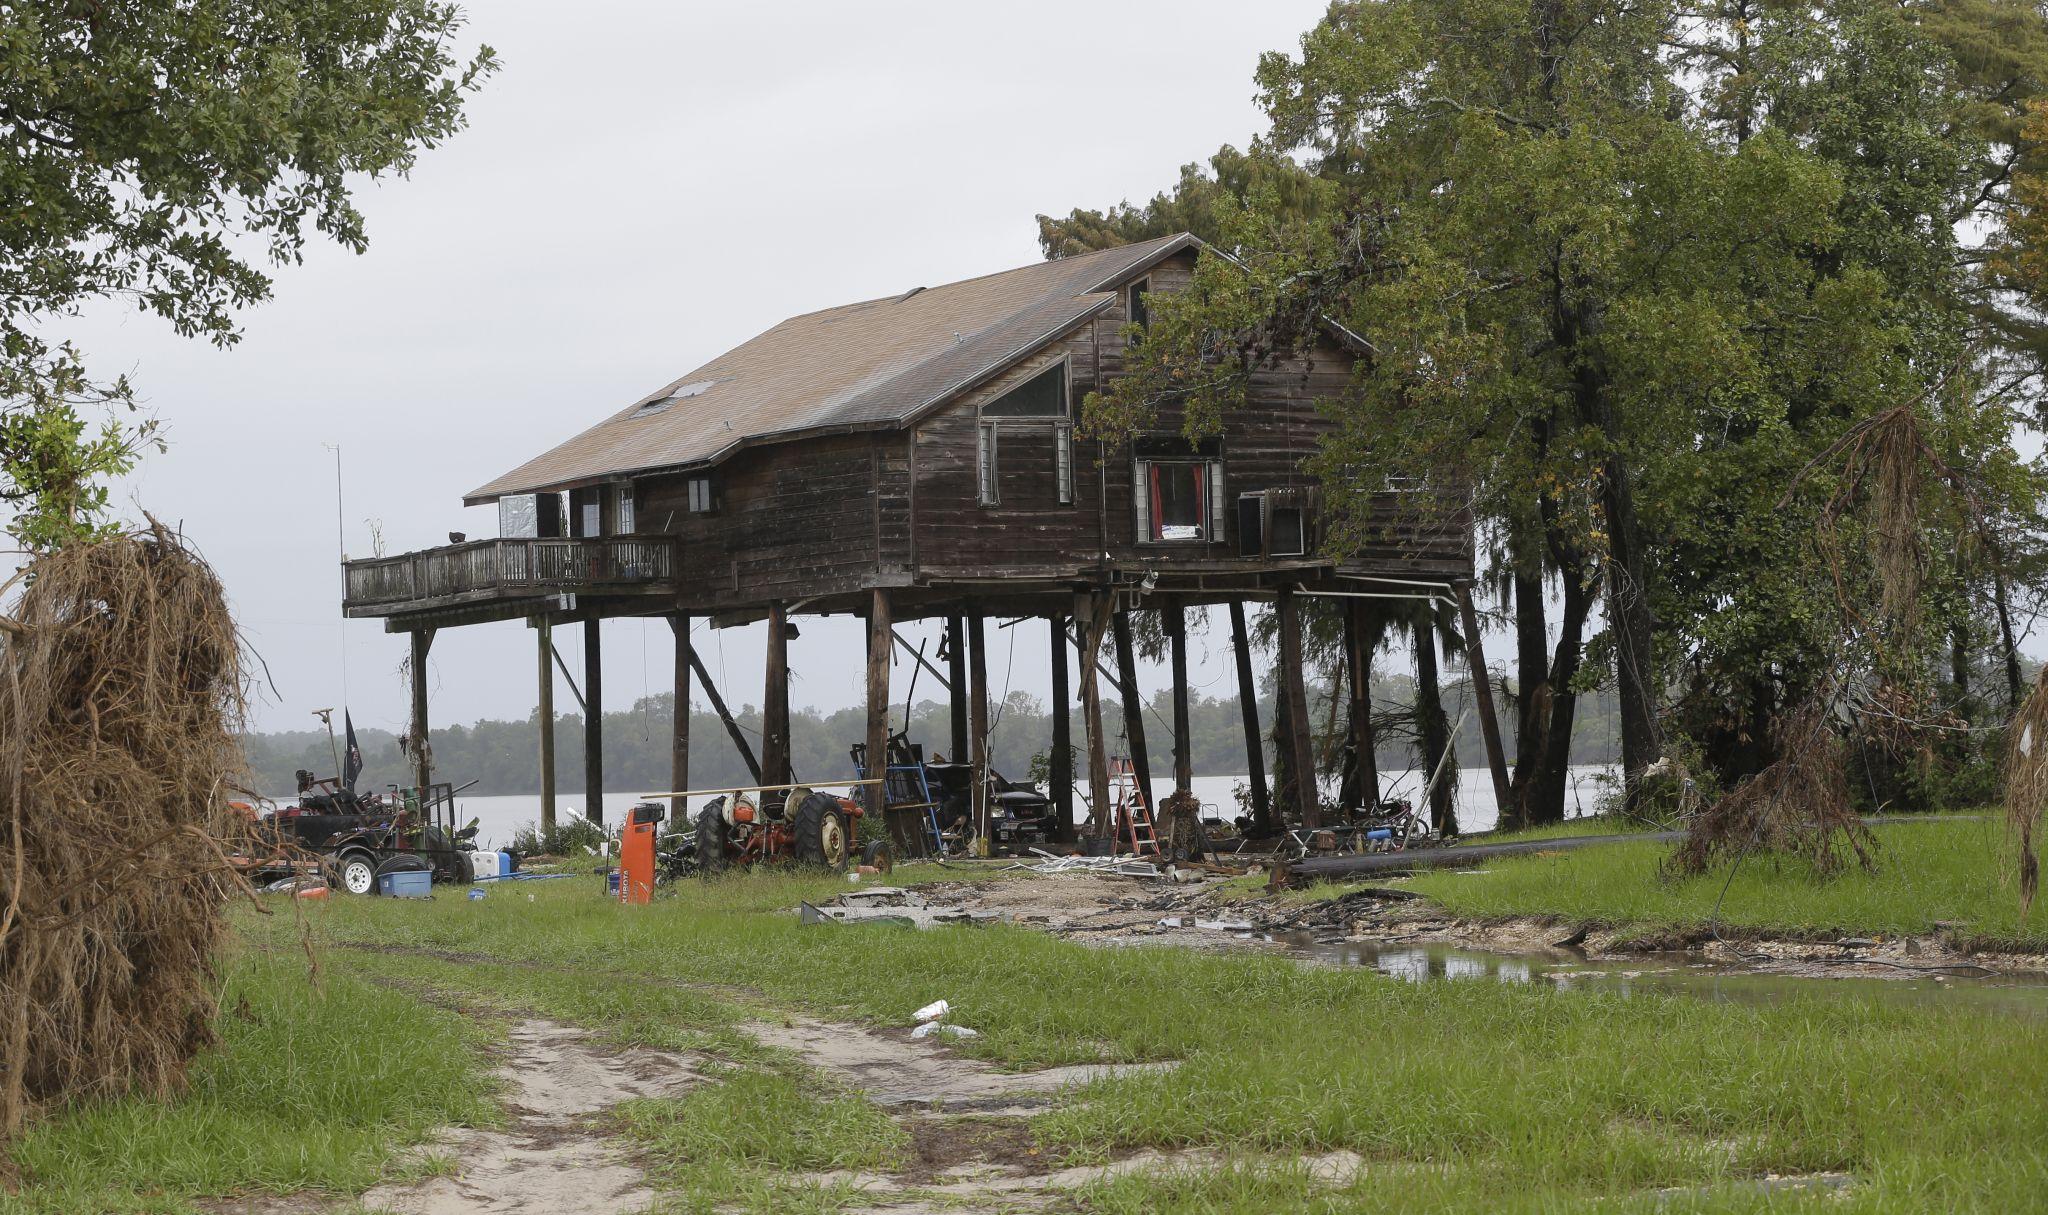 What's in Houston's worst flood zones? Development worth $13.5 ... on plane toys, plane photography, plane blueprints, plane advertising, plane doors, plane crafts,